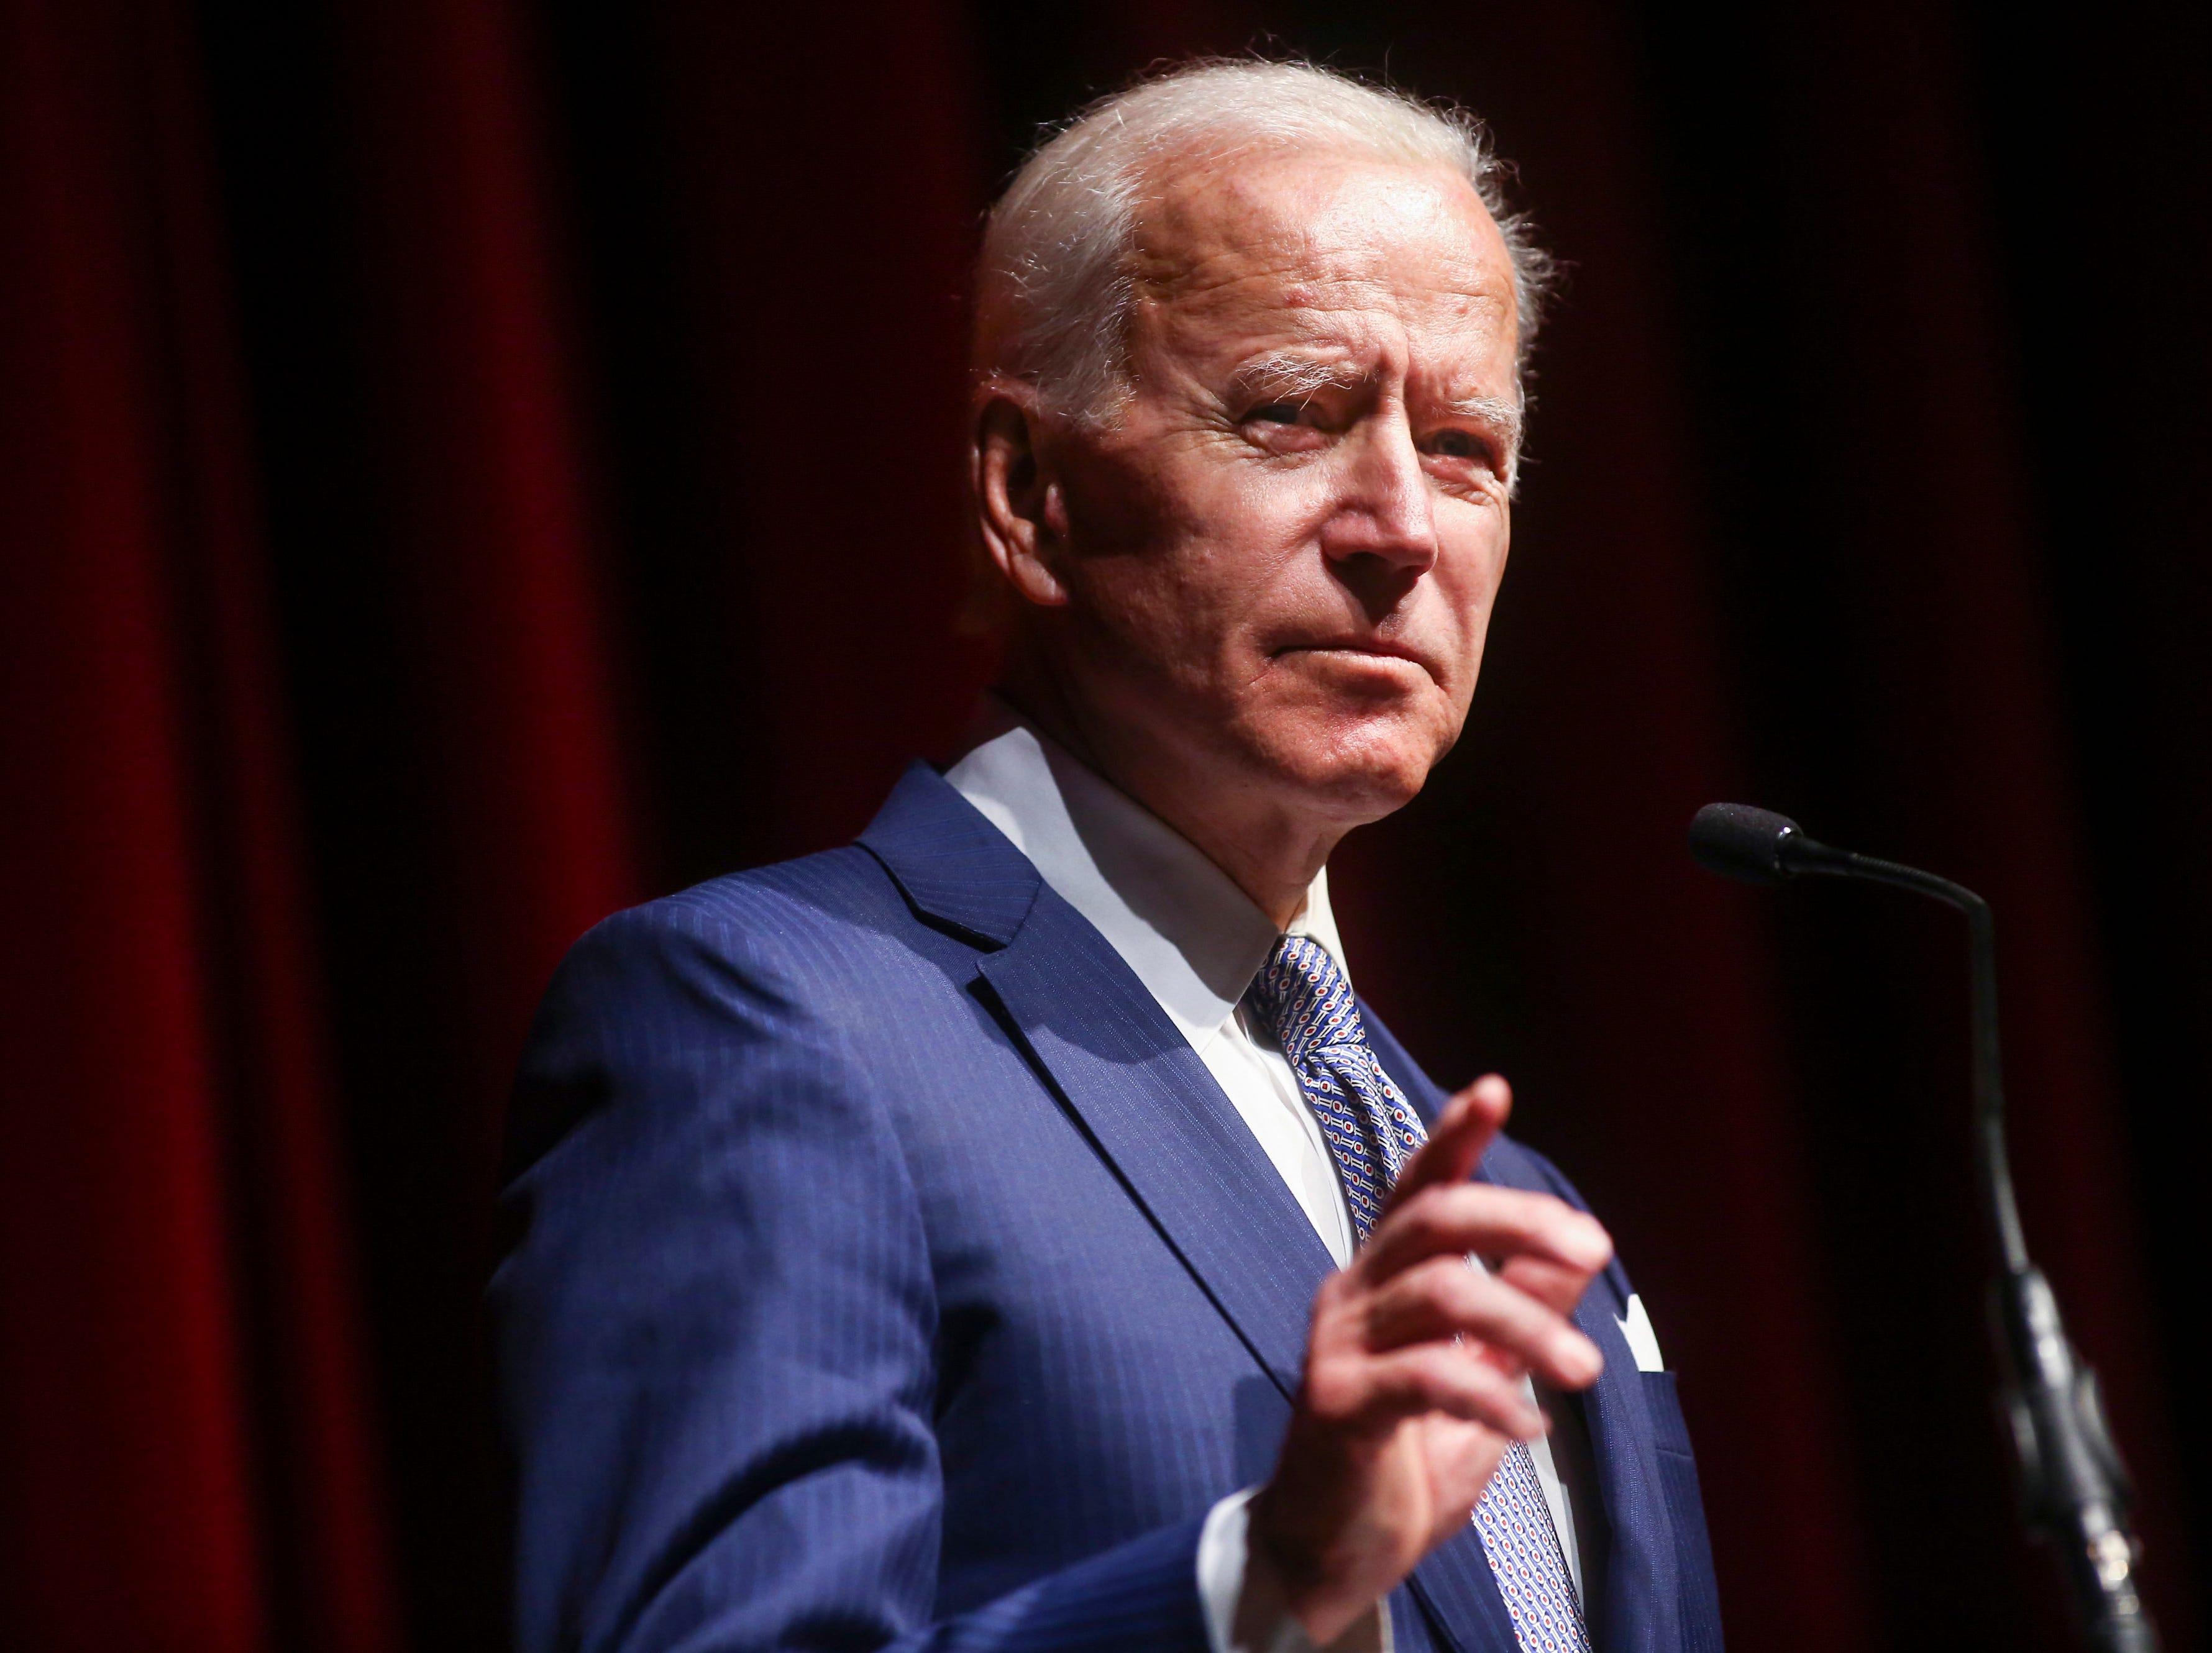 Biden urges political engagement in Brown University speech